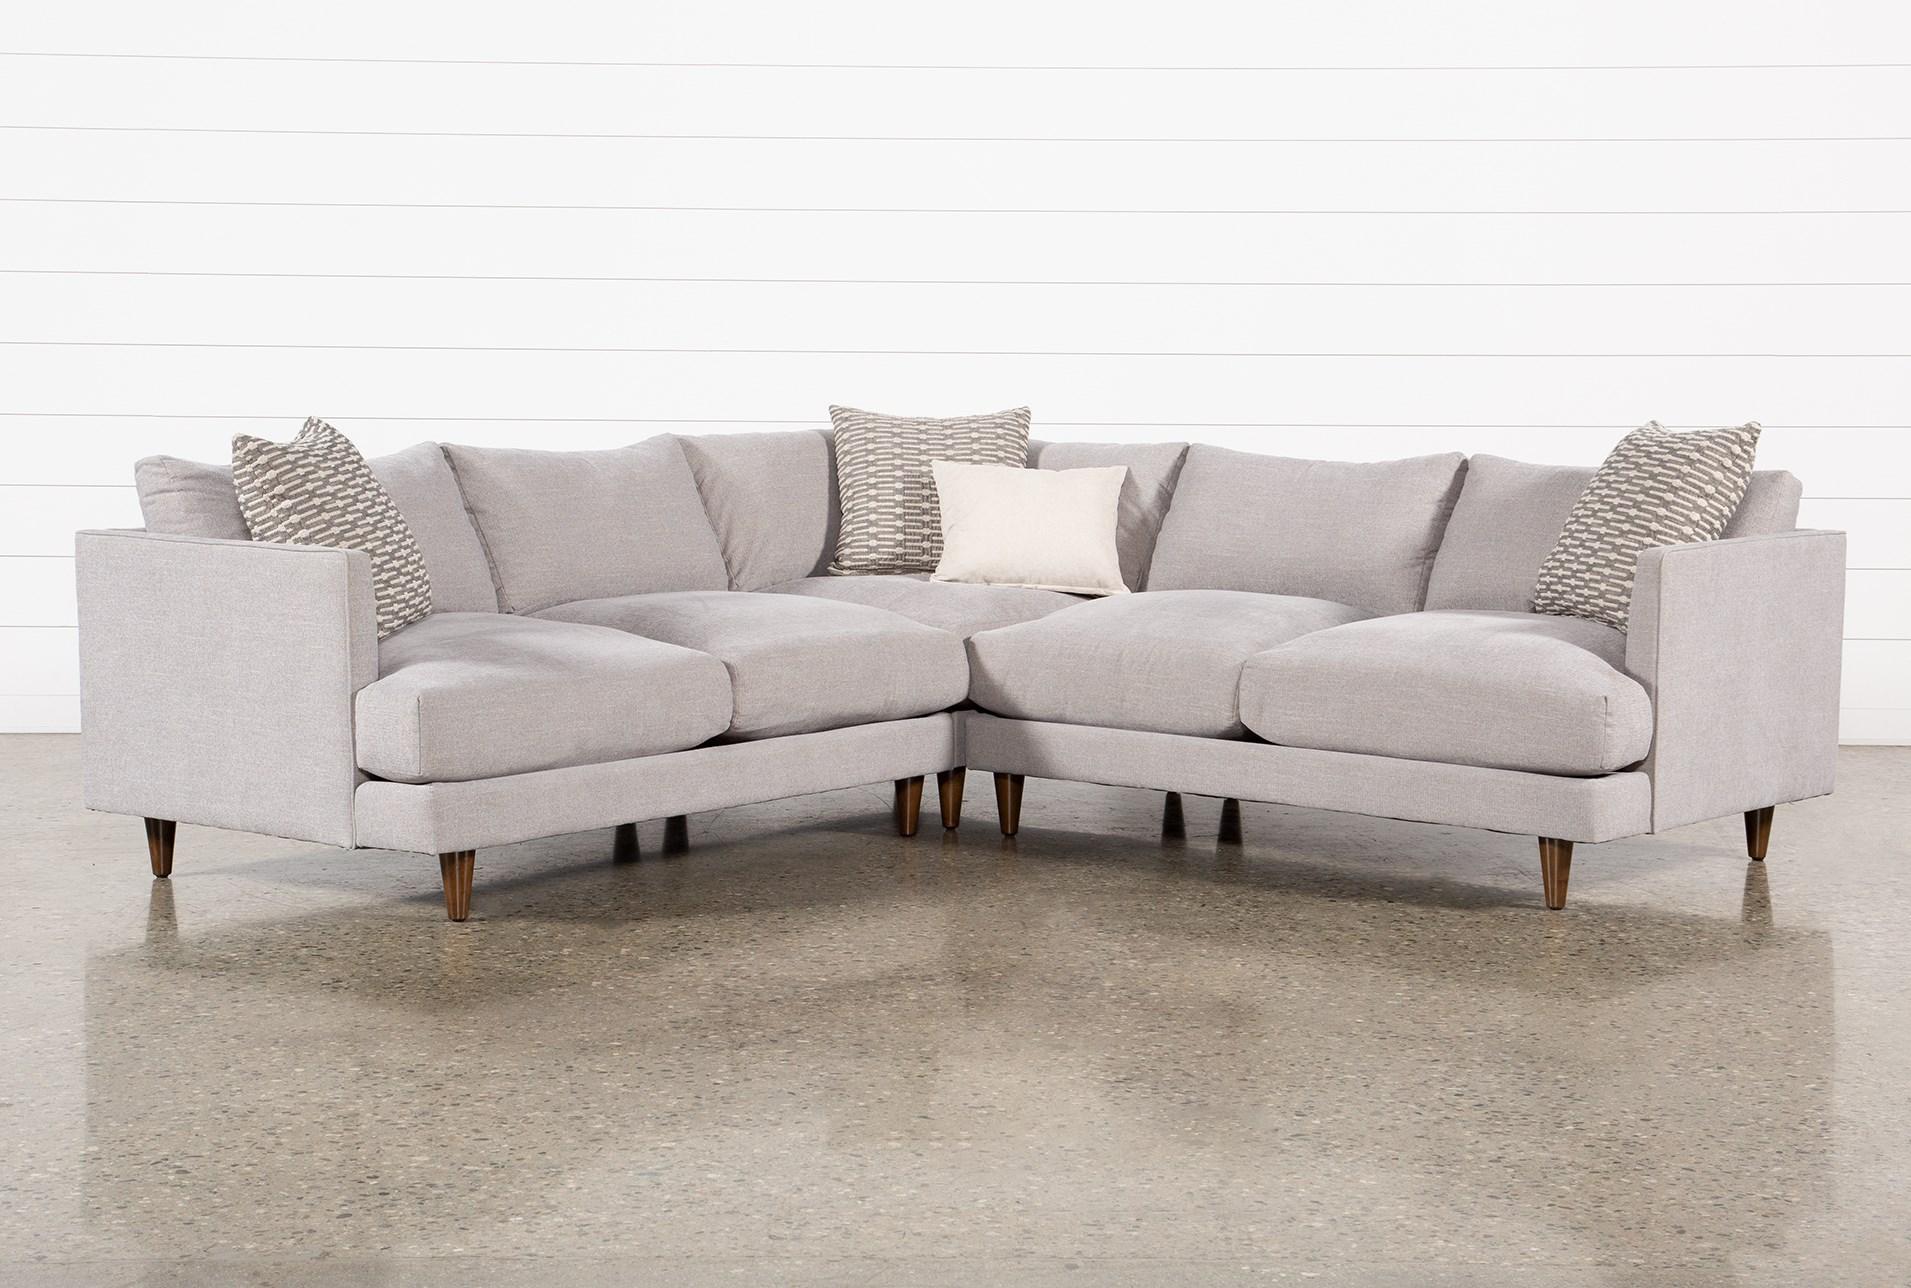 Adeline Ii 3 Piece 109 Sectional, Comfort Living Furniture San Leandro